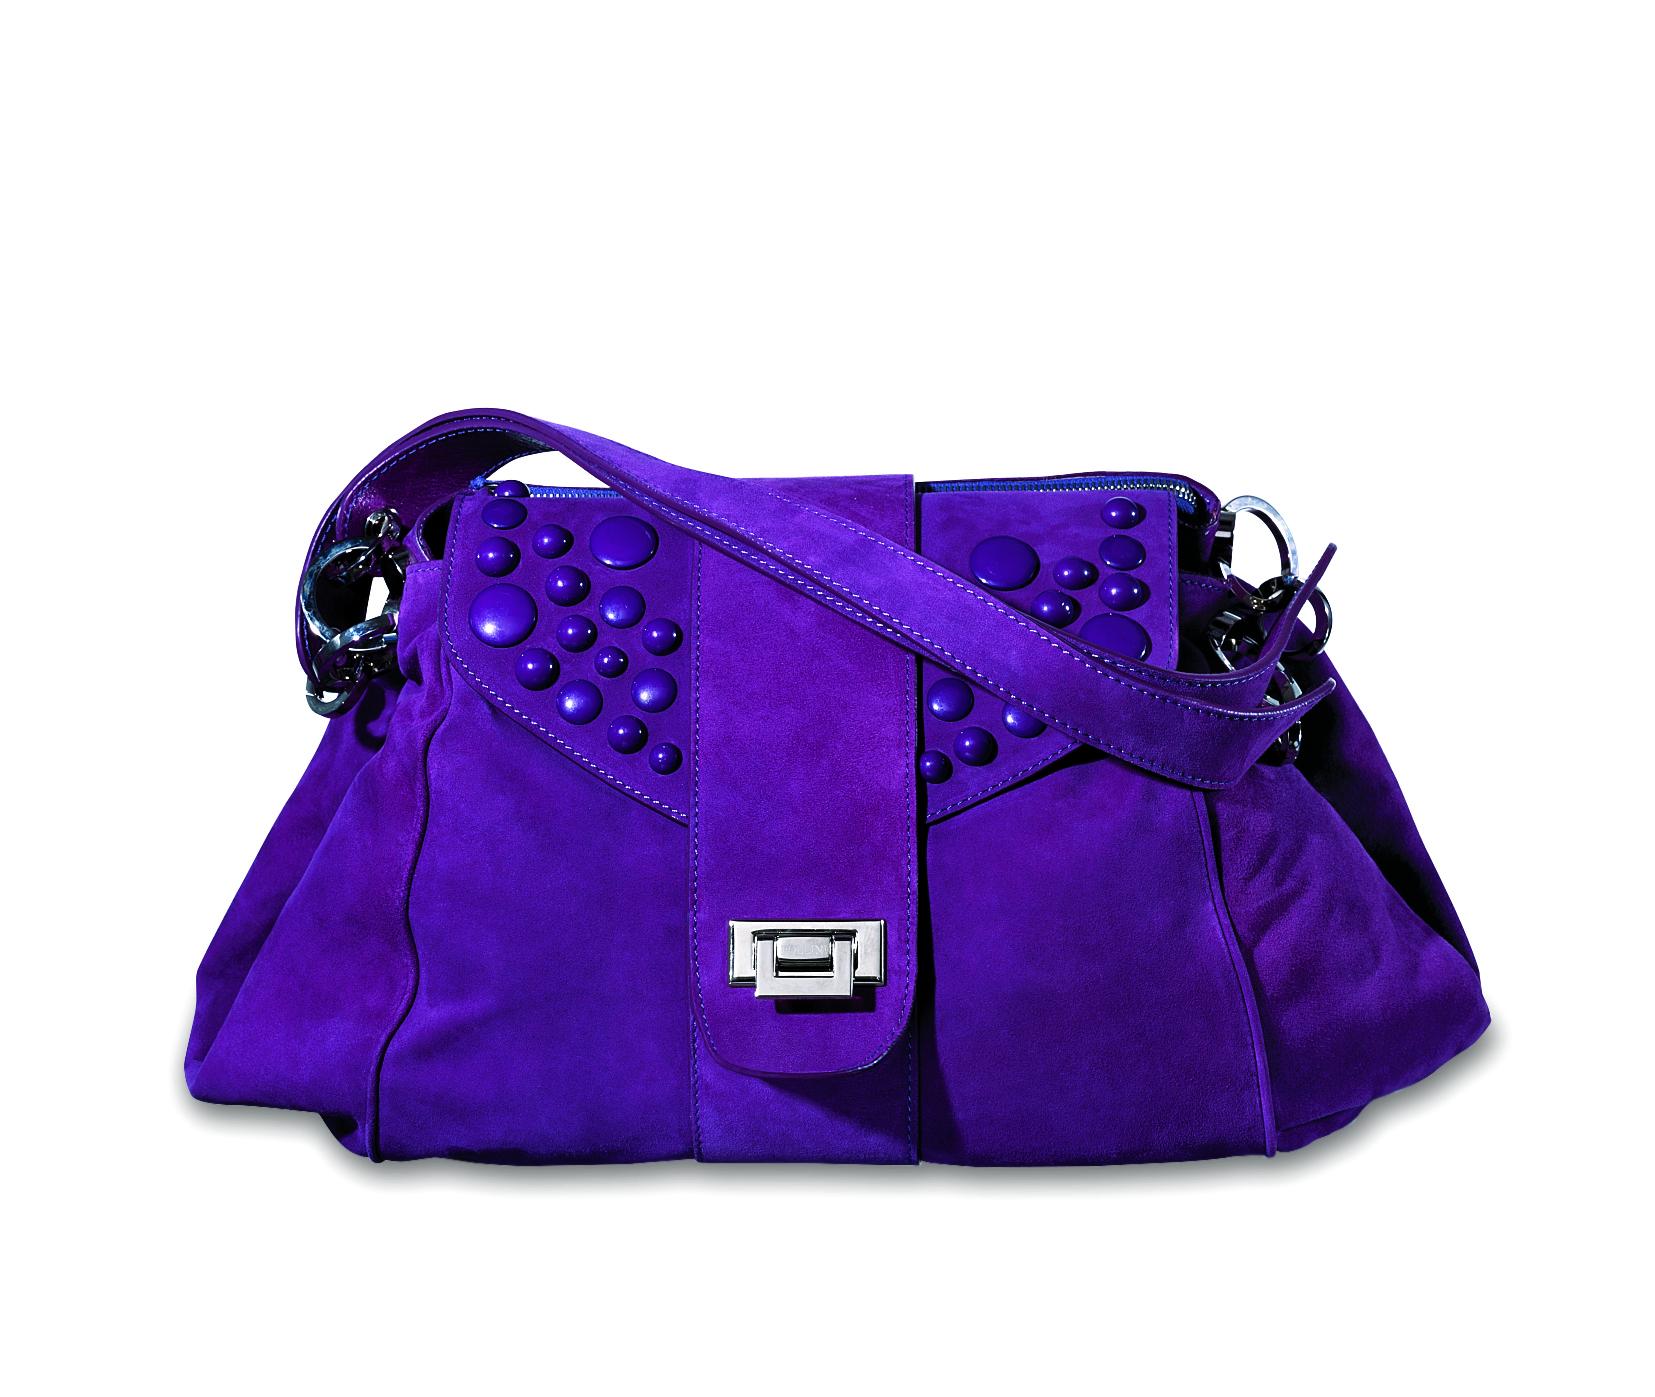 purplebag_after.jpg